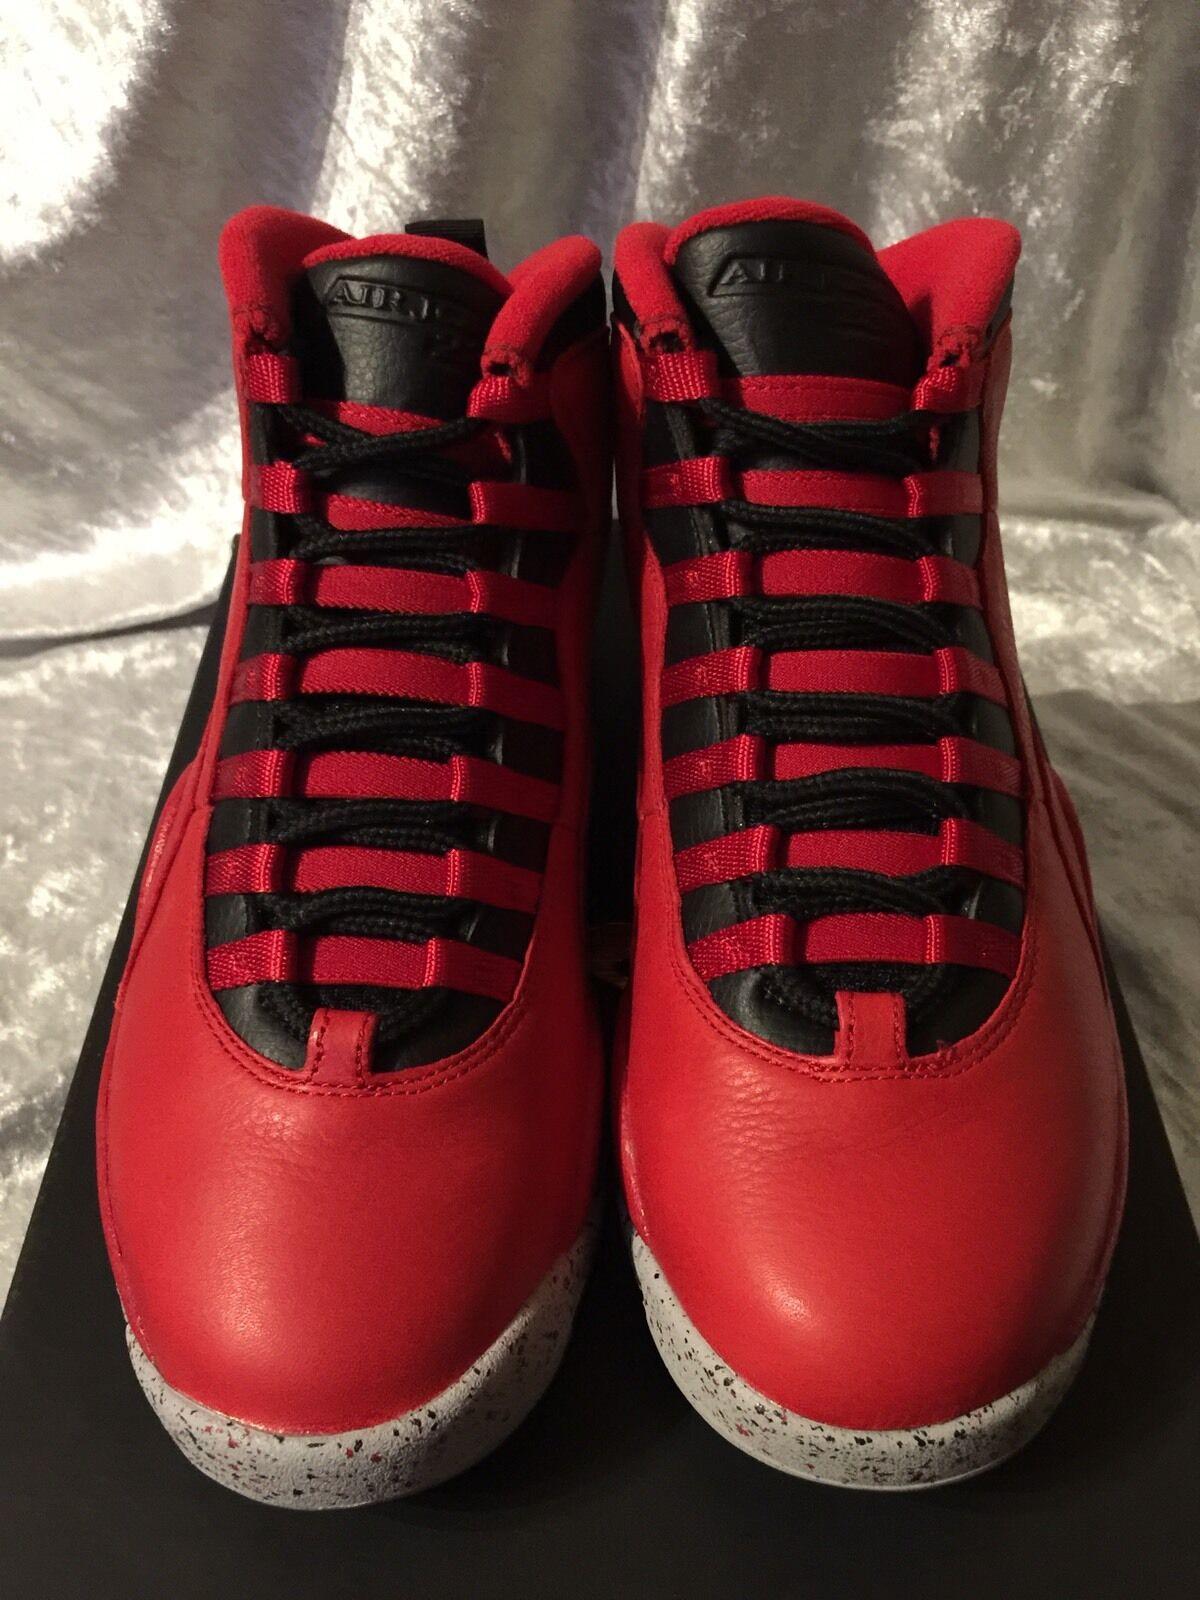 Nike jordan 10 retro rosso / blk tori per bway dimensioni